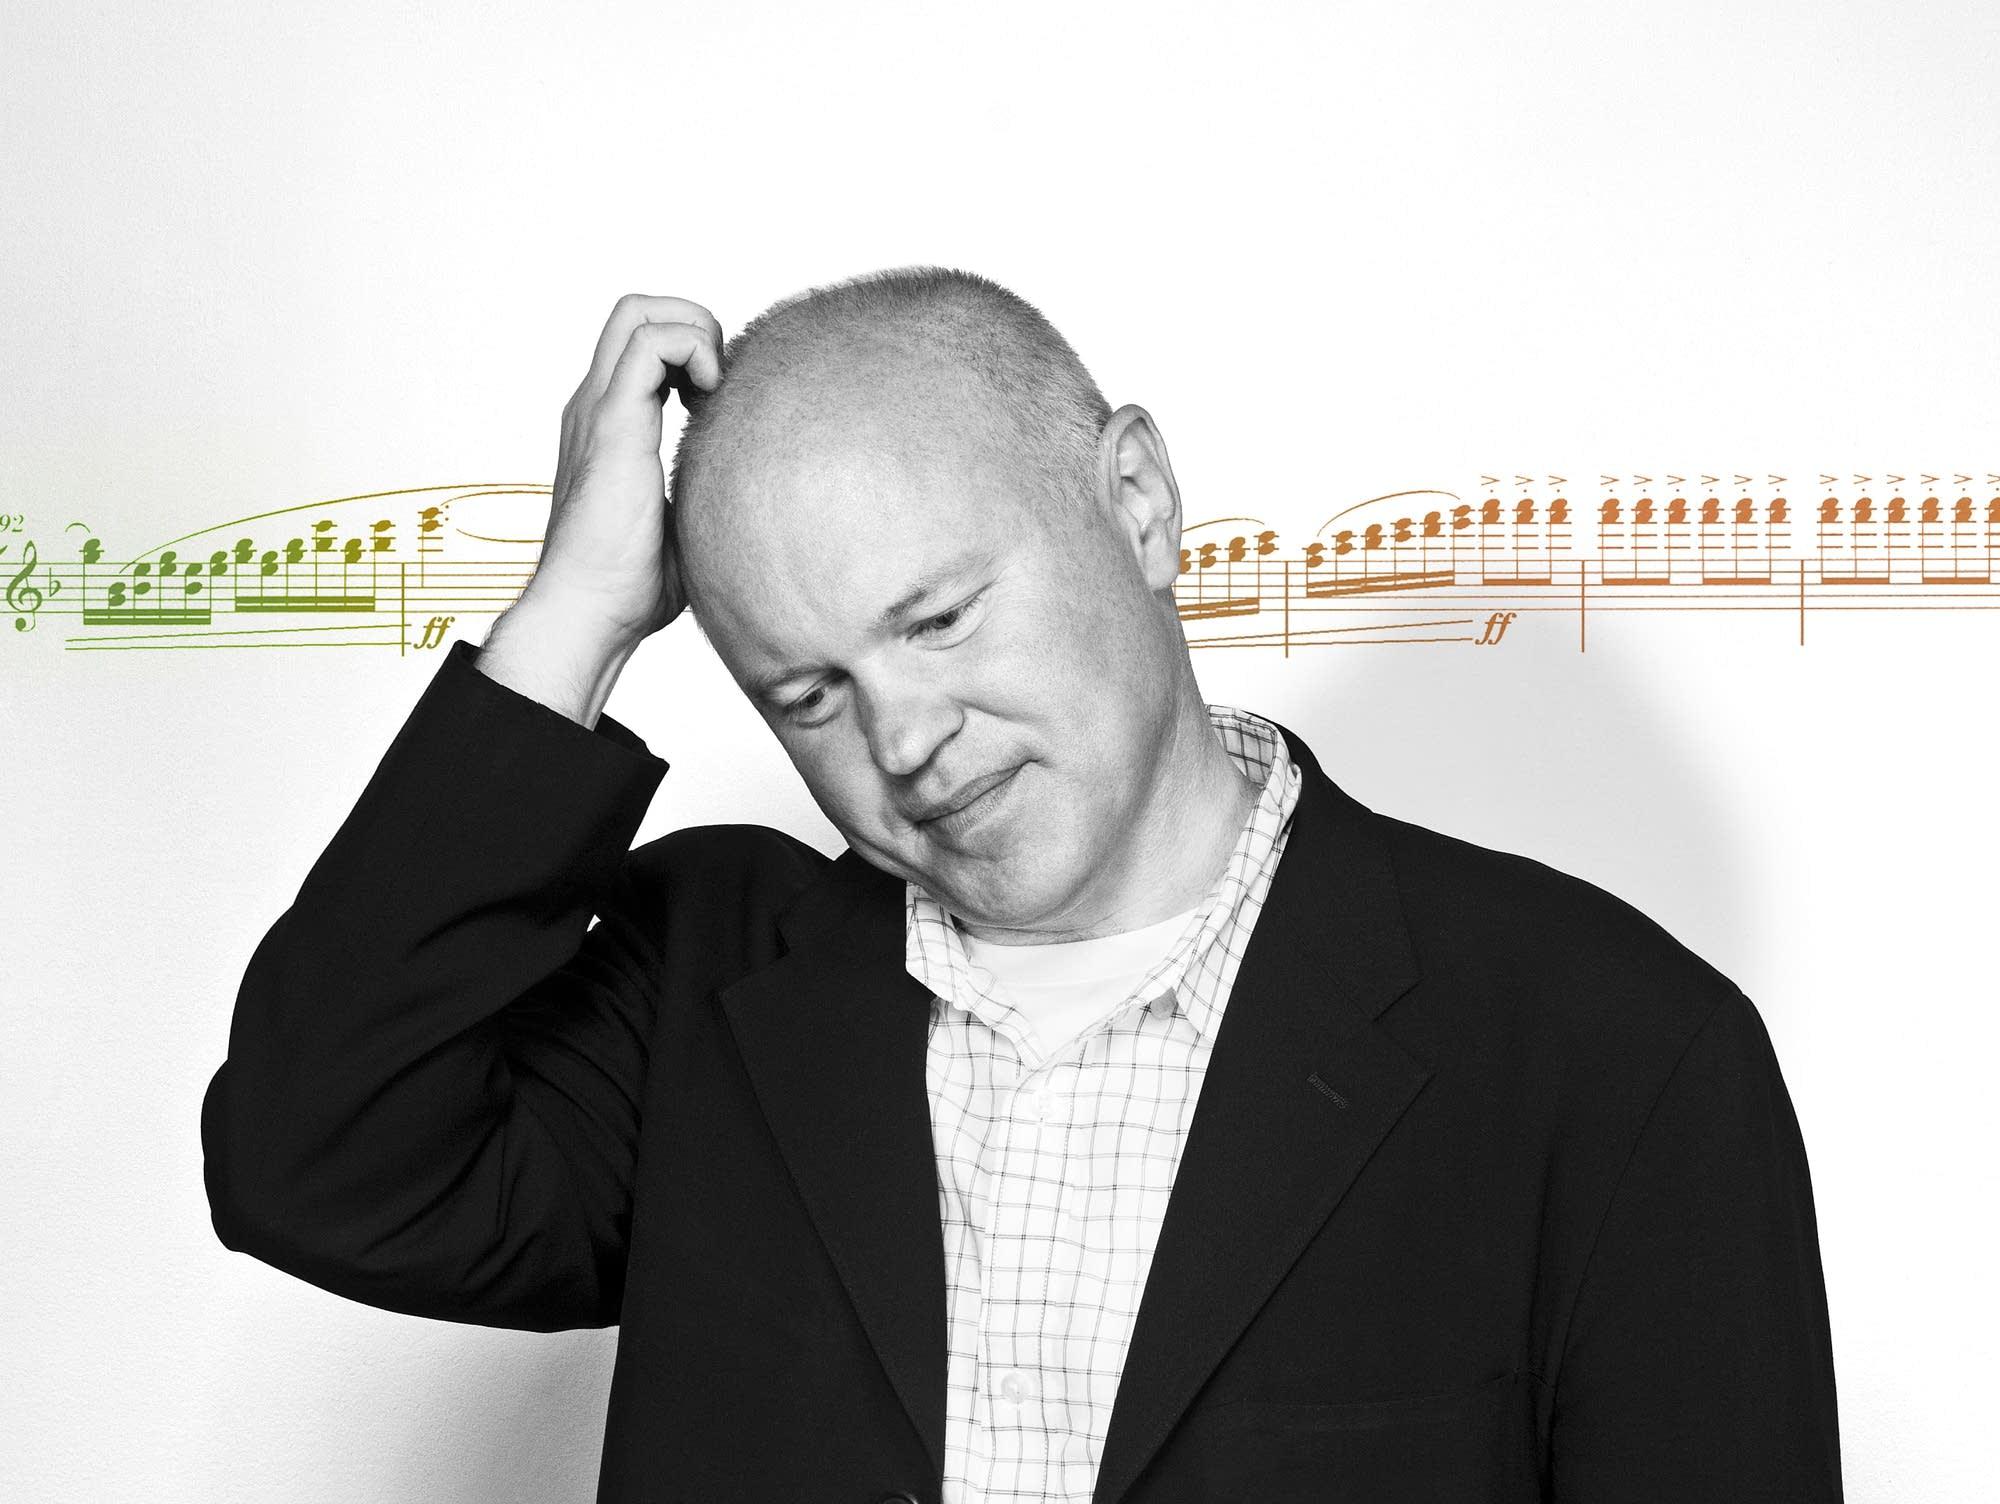 Composer Michael Torke